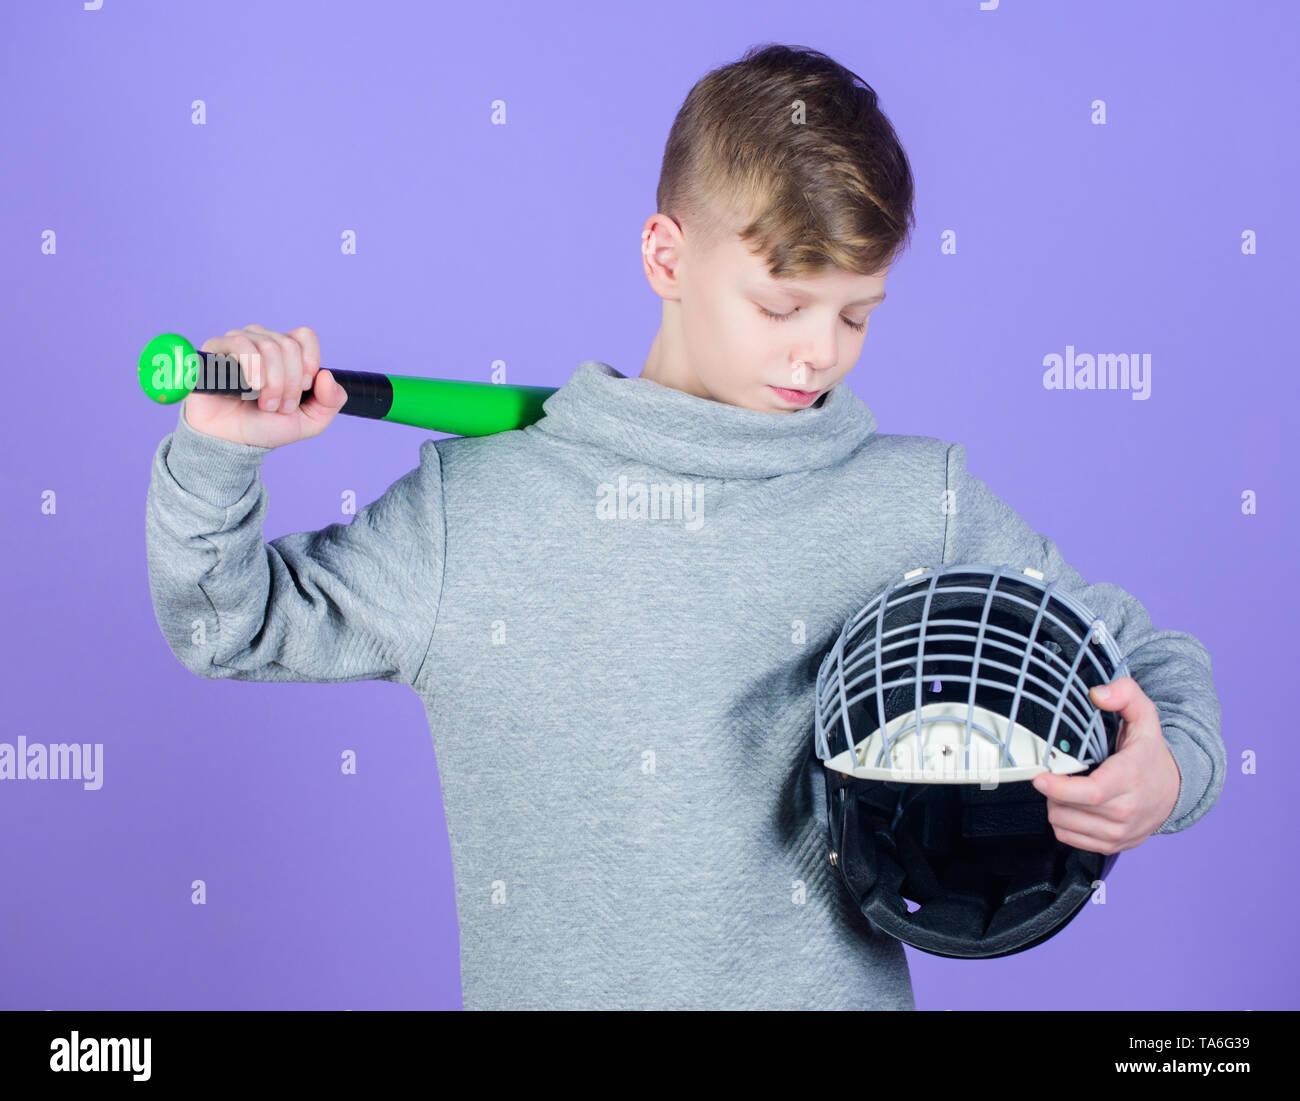 Teenager boy likes baseball. Active leisure and lifestyle. Healthy childhood. Enjoy active game. Join baseball team. Sport and baseball training concept. Boy hold baseball bat. Sport and hobby. - Stock Image